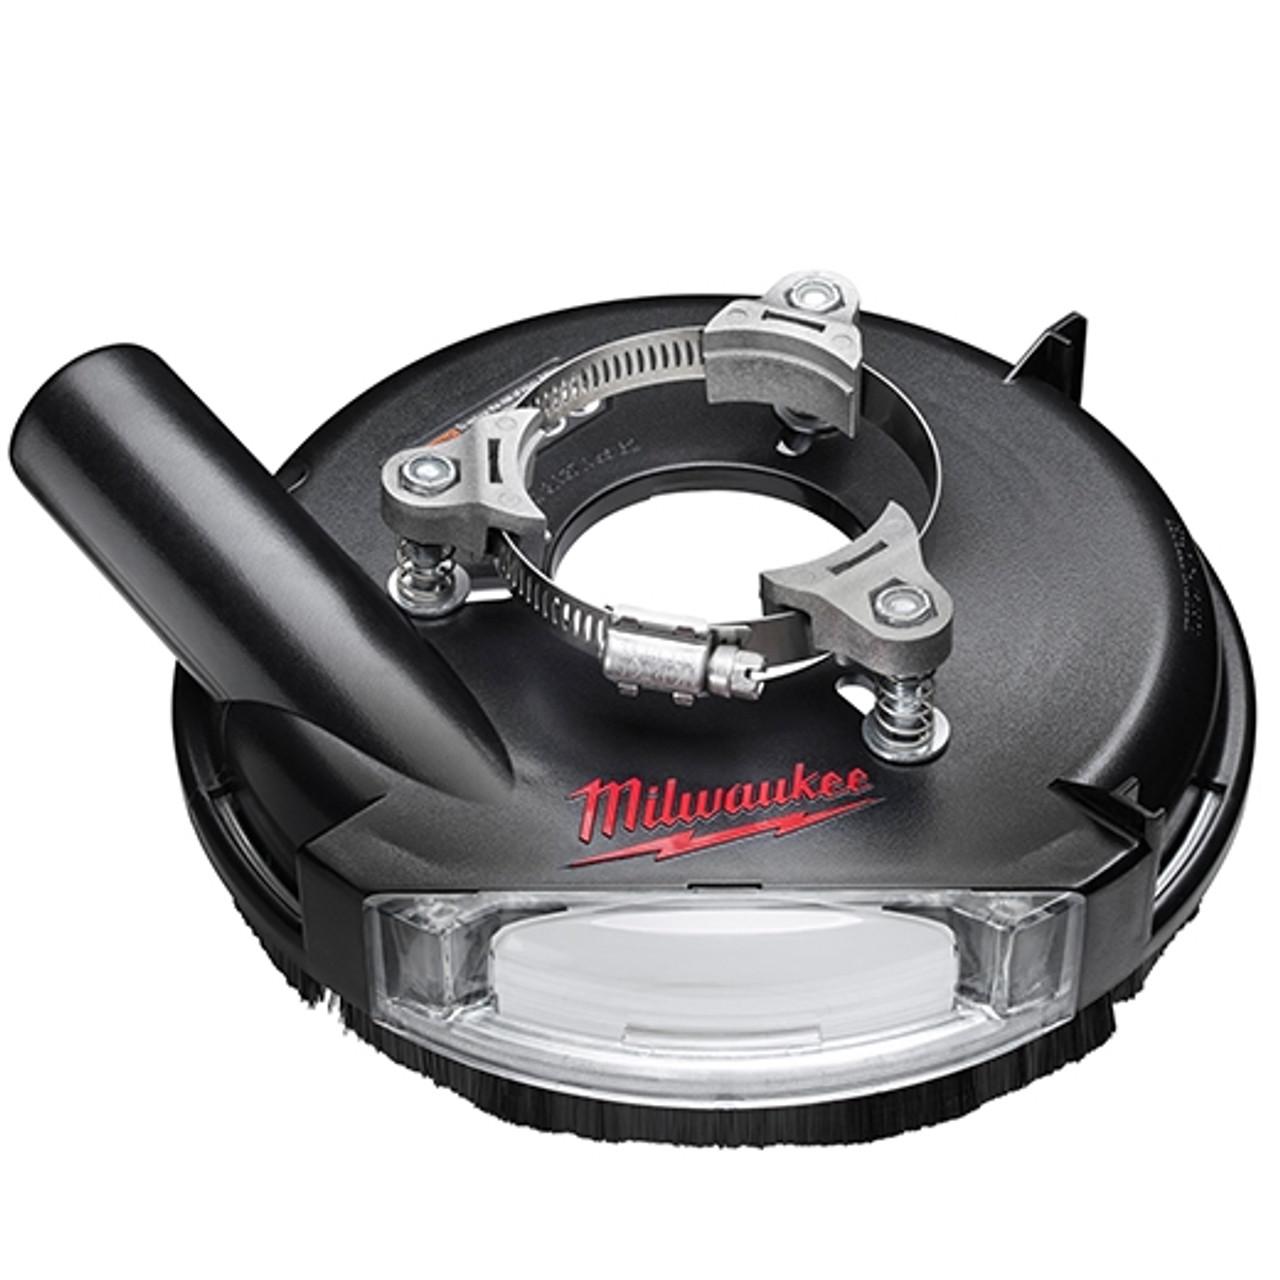 Milwaukee 49-40-6105 7 in. Universal Surface Grinding Dust Shroud